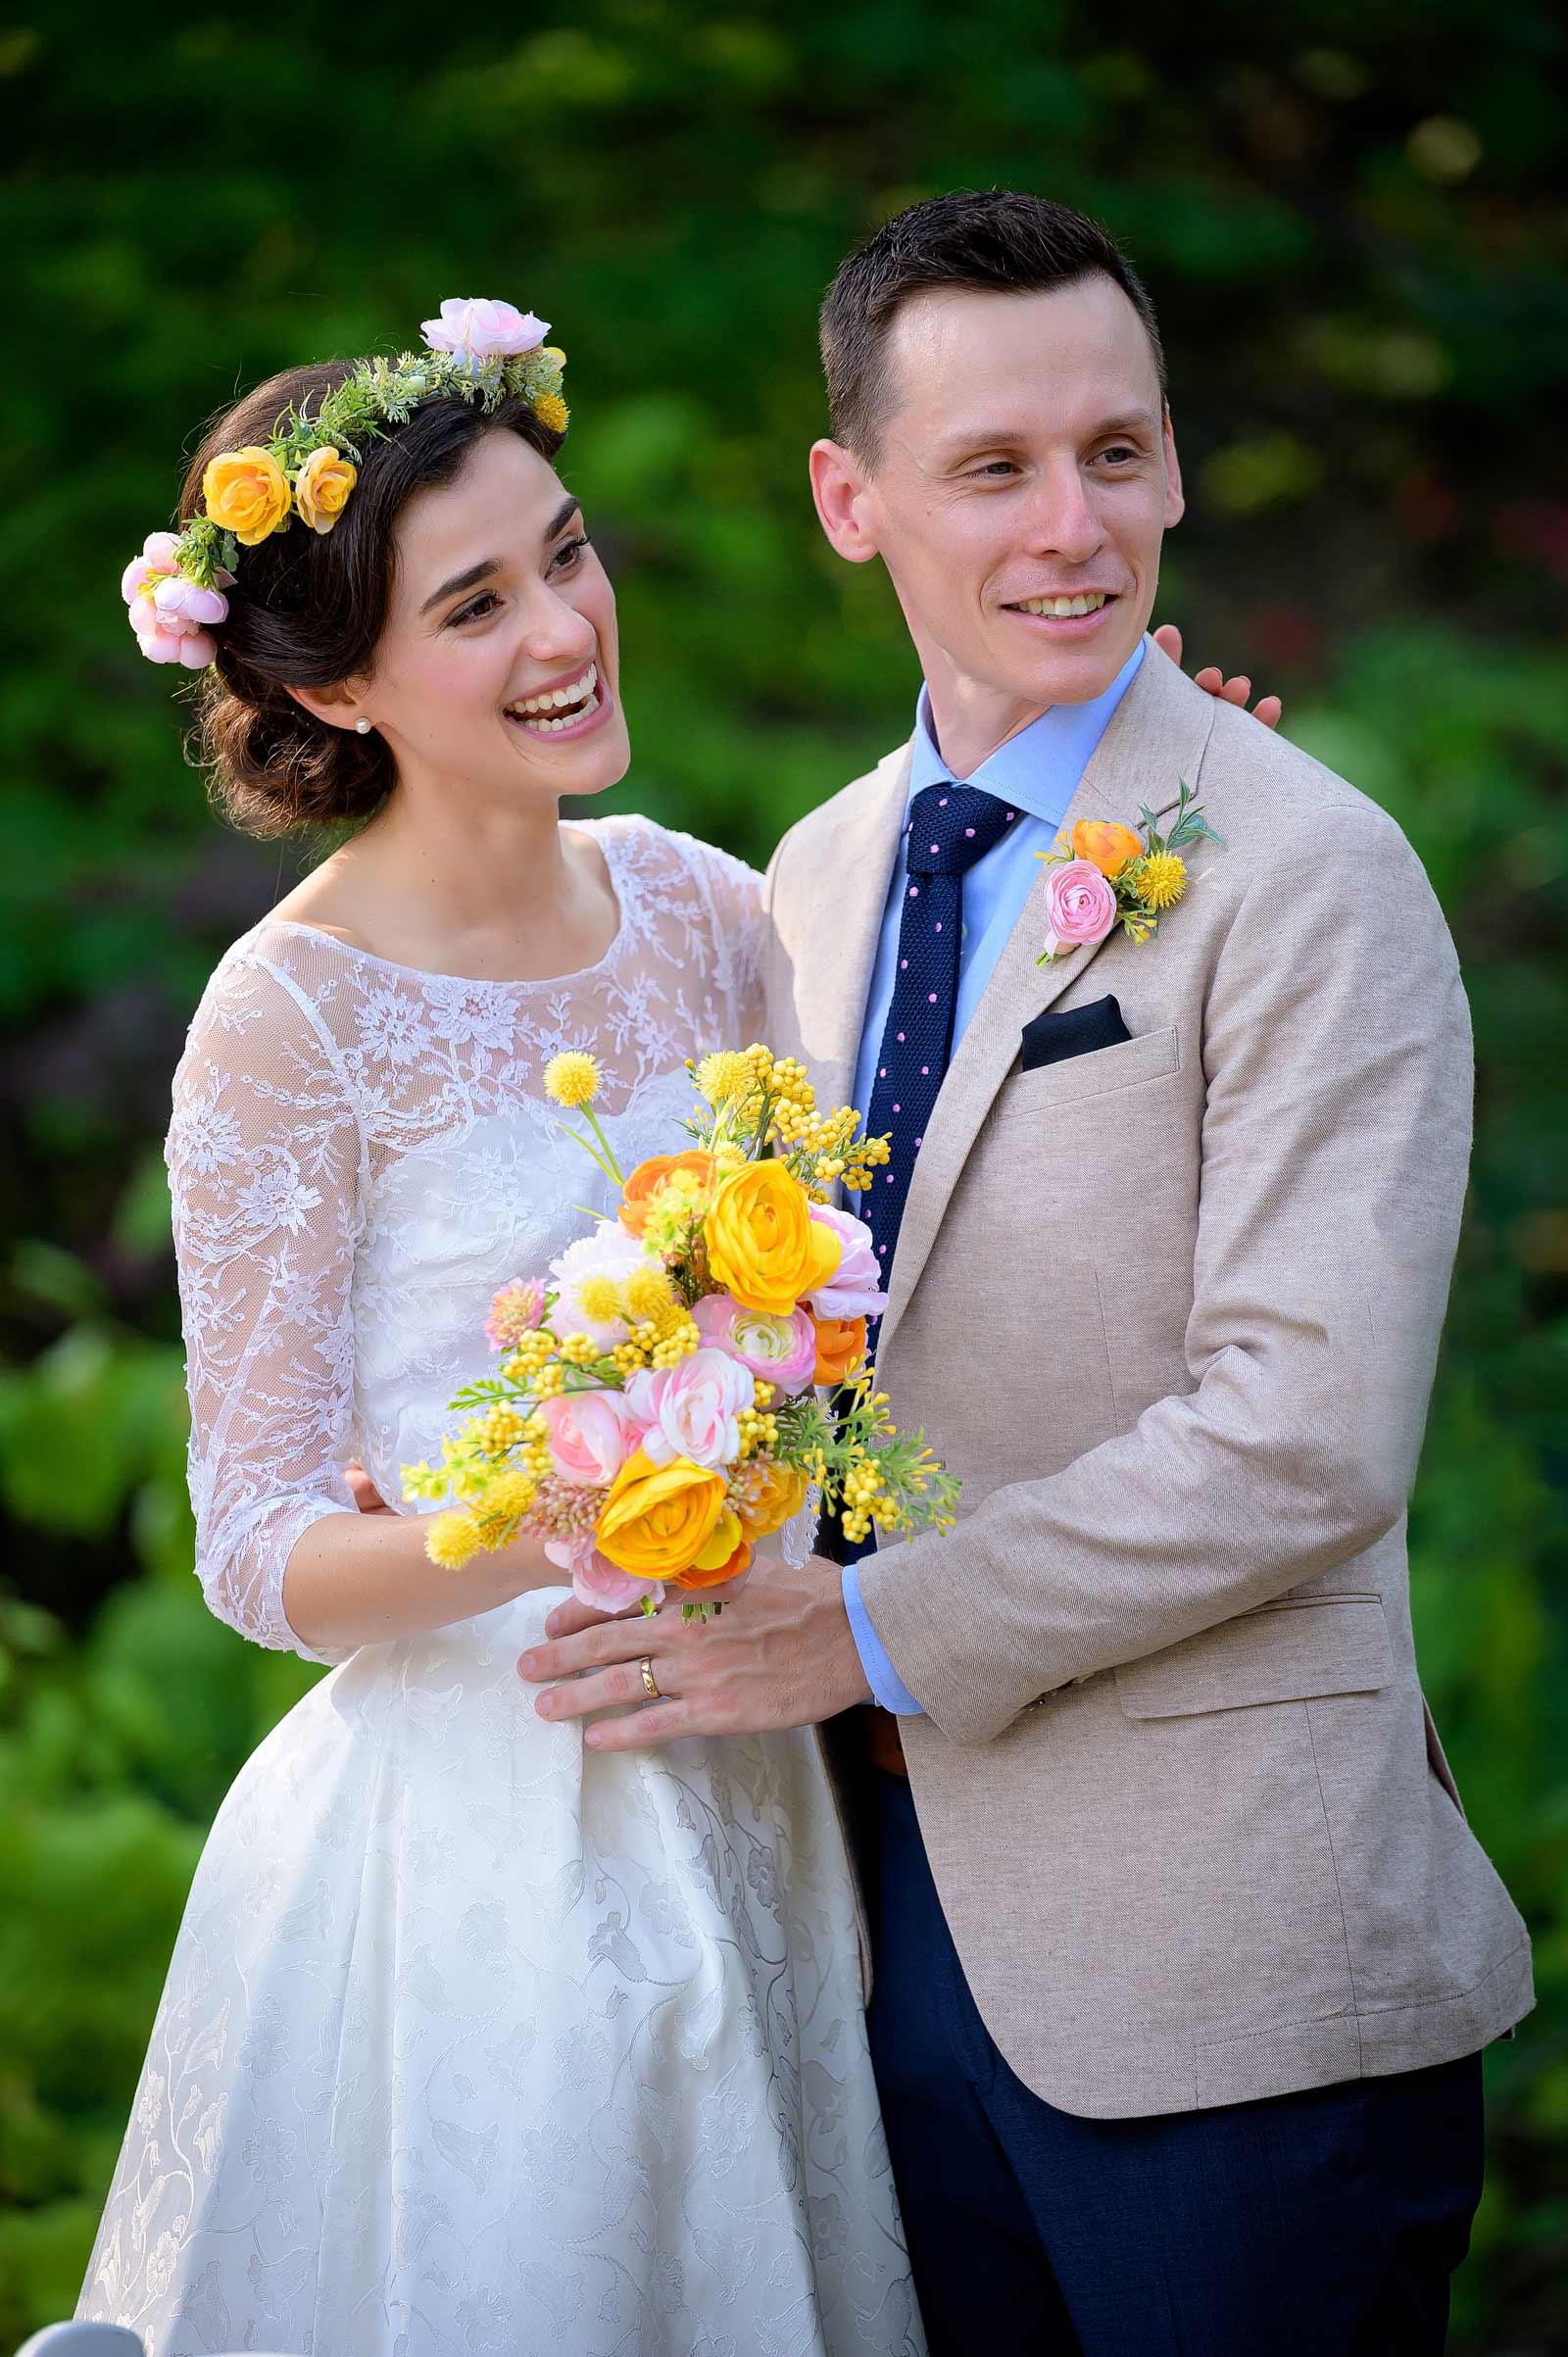 rebeccatrevor-wedding-sneakpeek-11